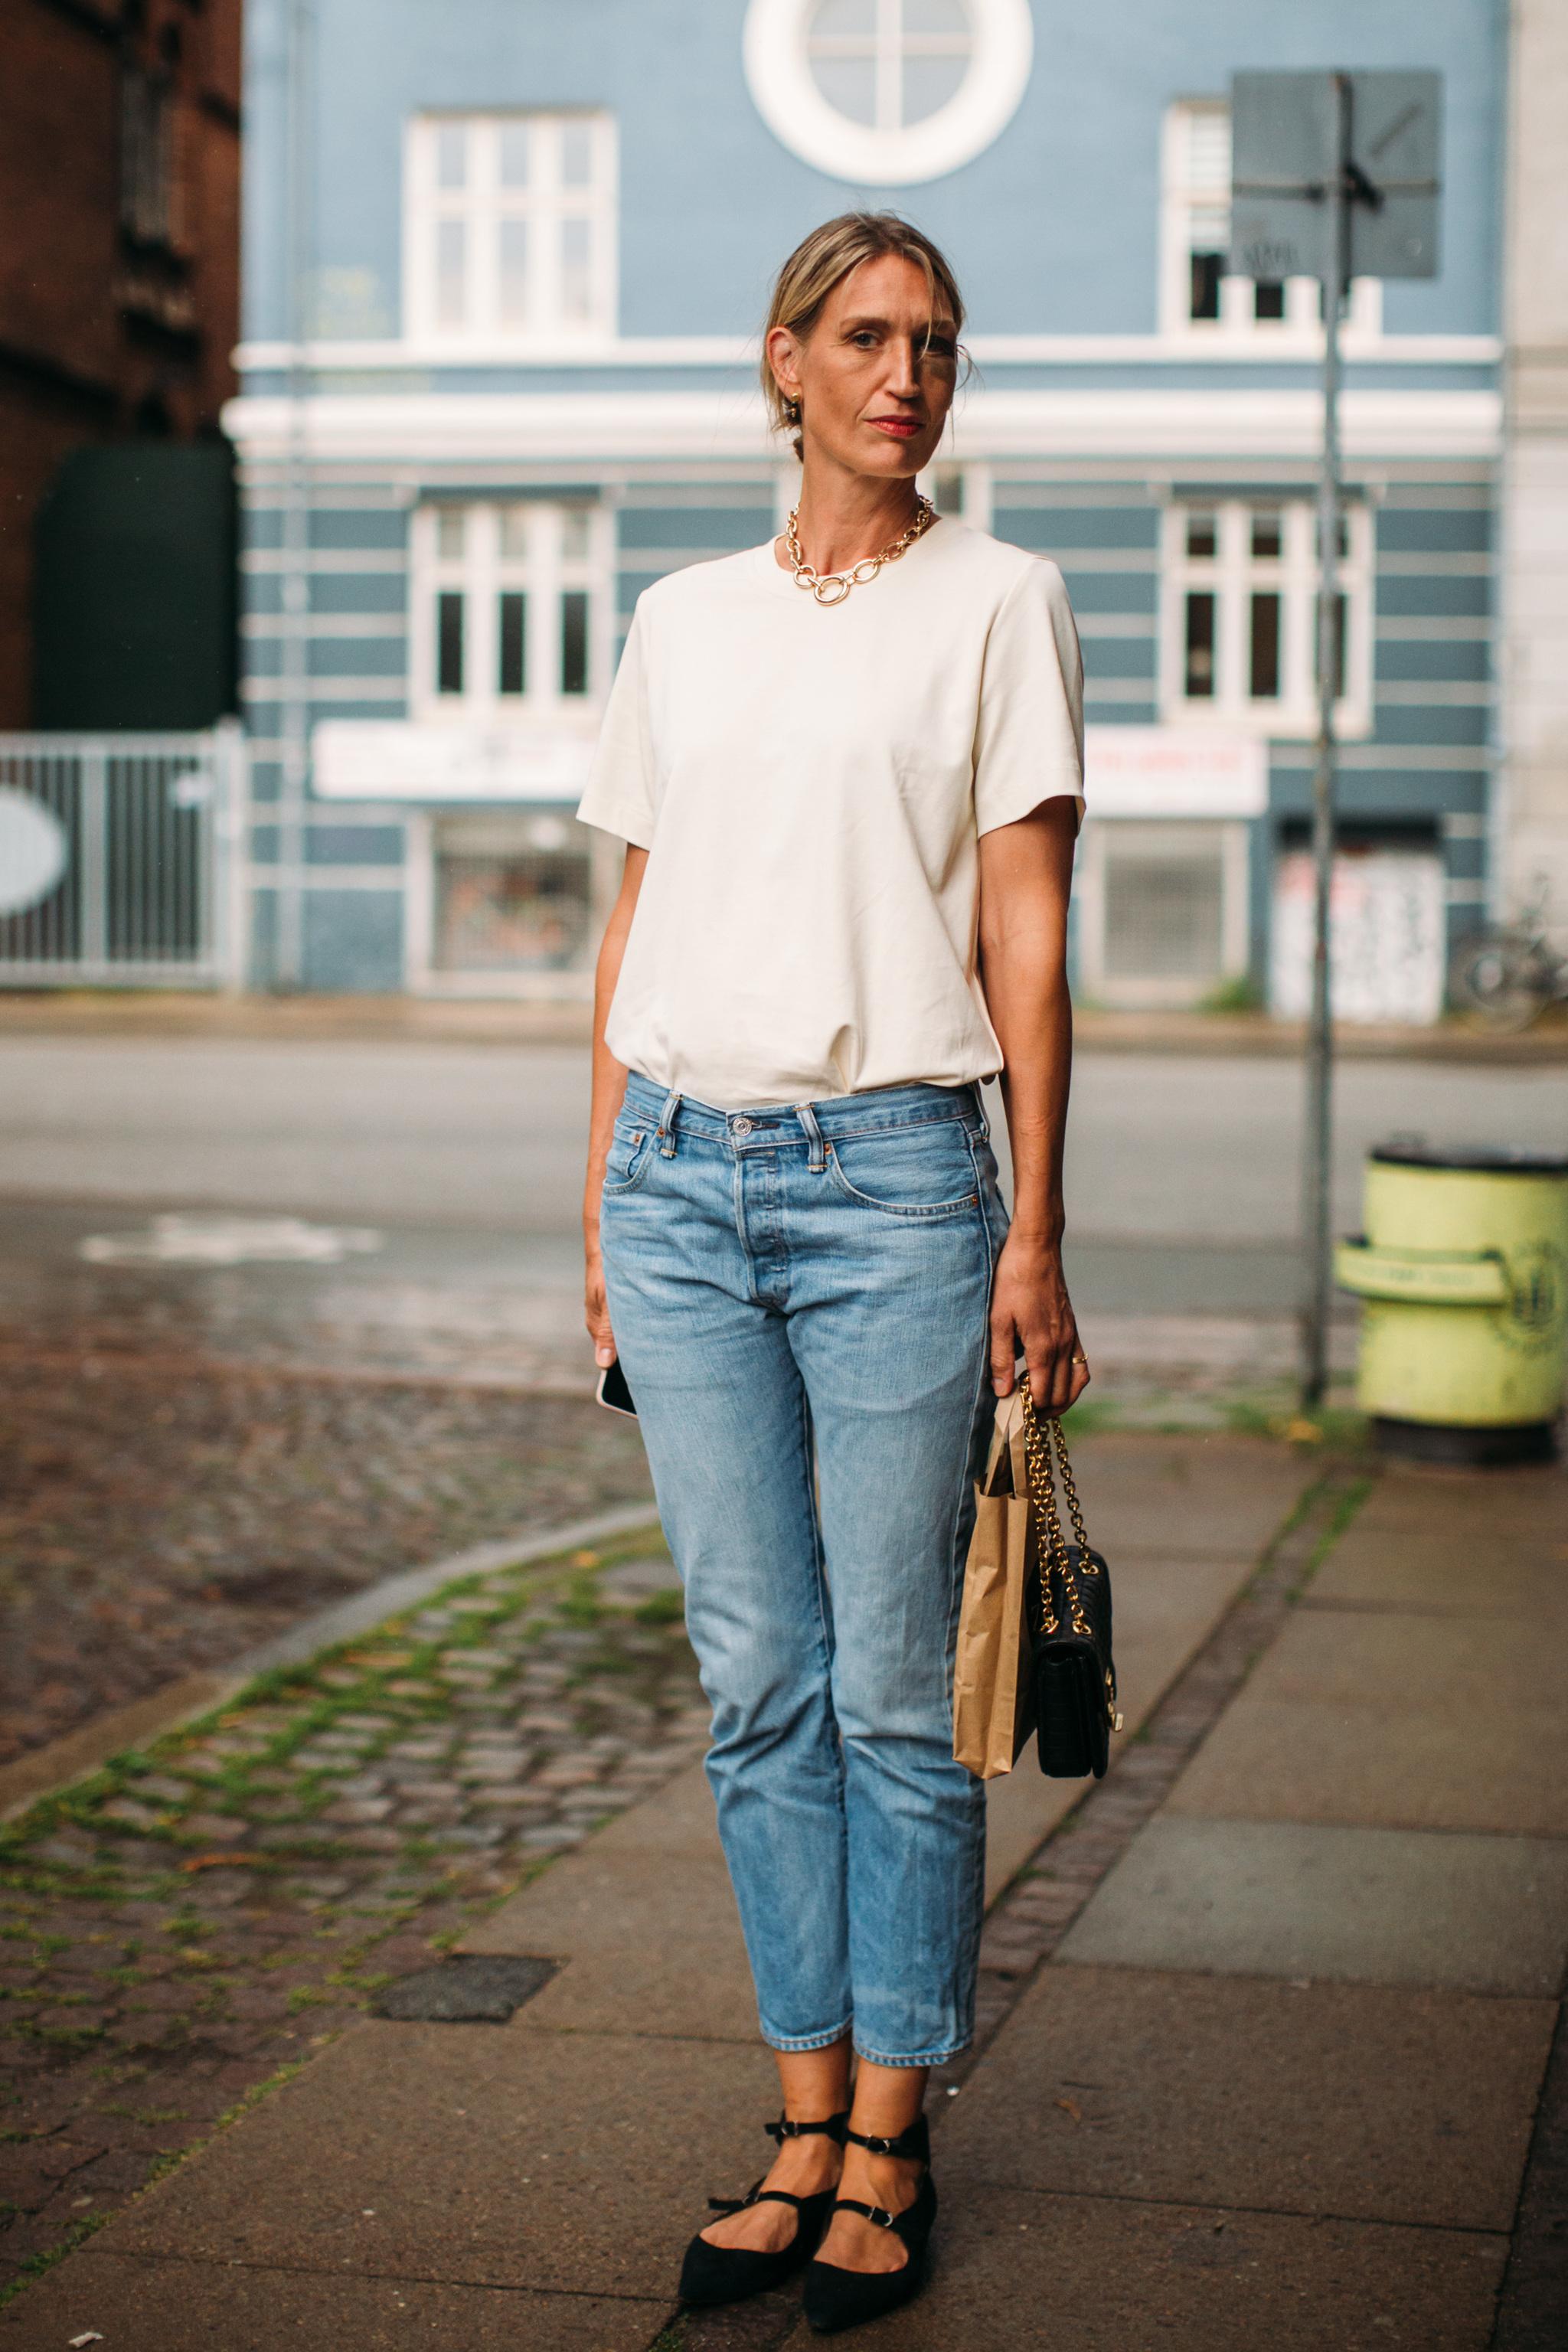 T shirt blanca y jeans azul lavado.